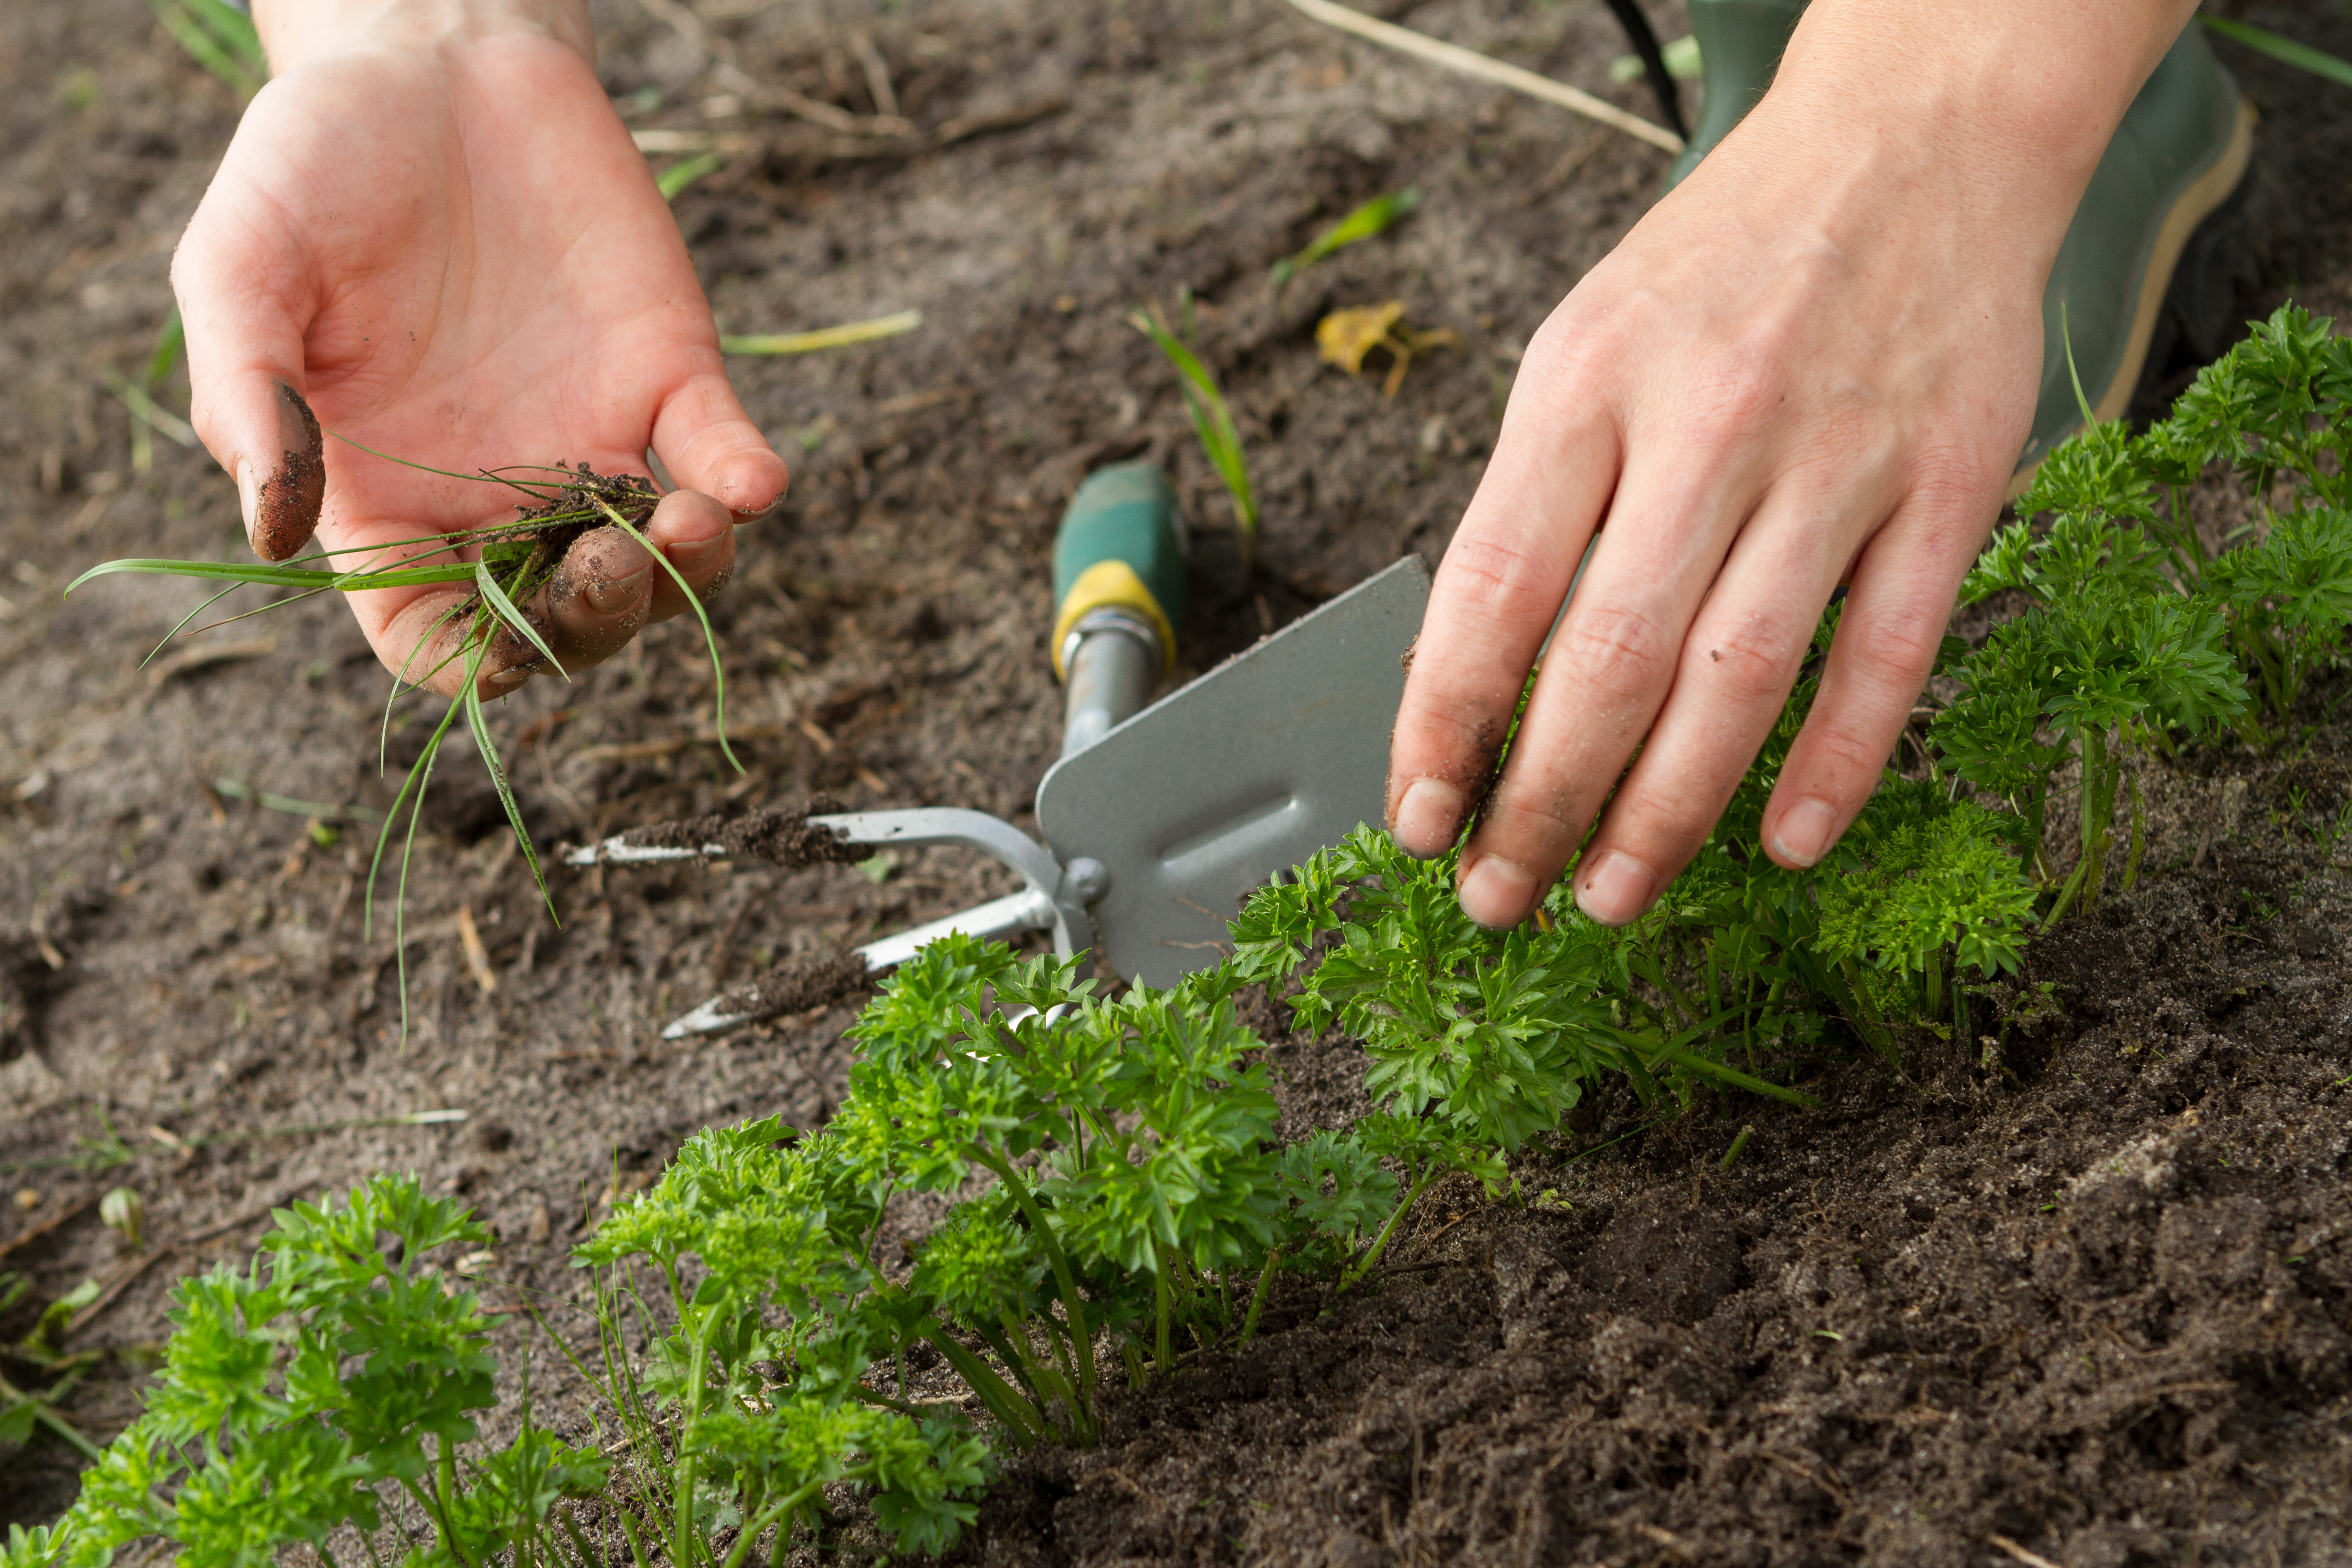 woman hands weeding parsley bed